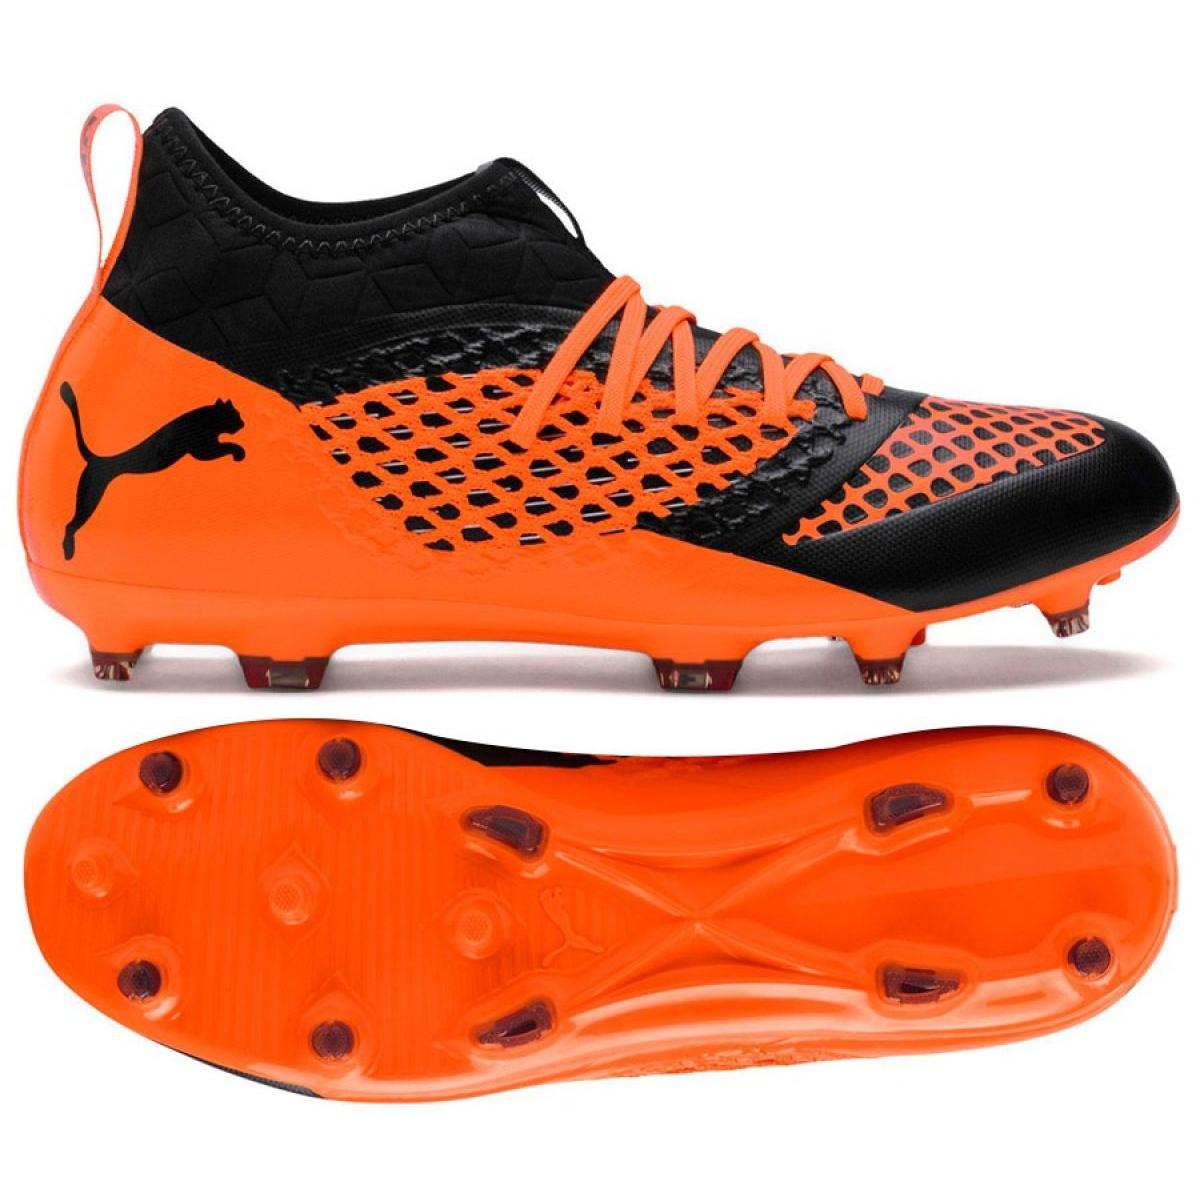 Chaussures de football Puma Future 2.3 Netfit Fg M 104832 02